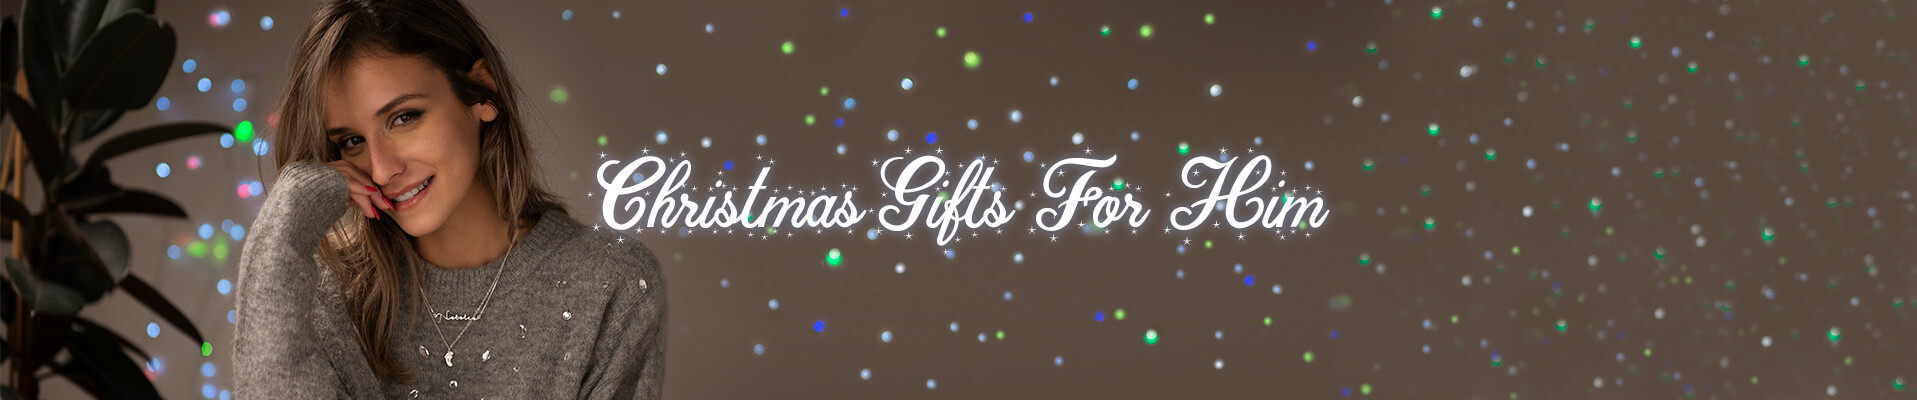 Christmas gifts for him desktop banner